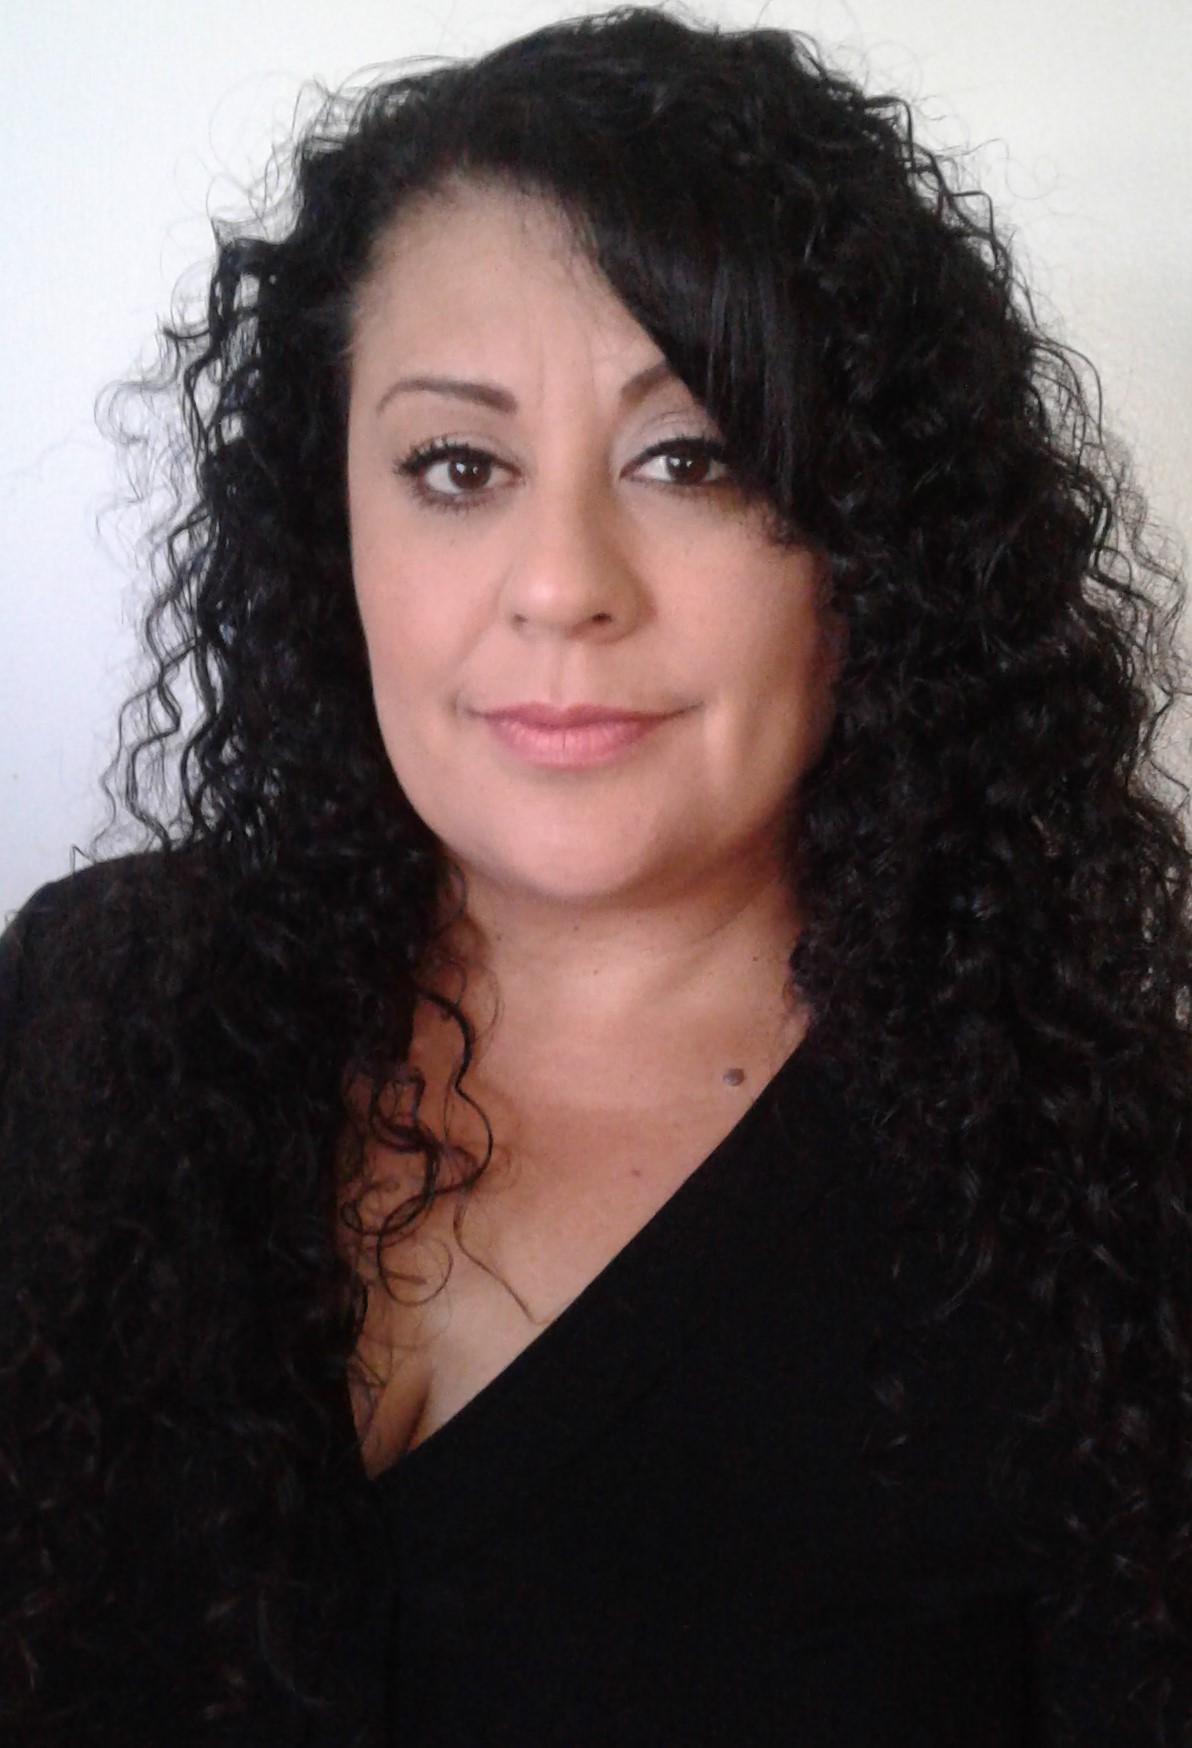 Teresa Adipietro